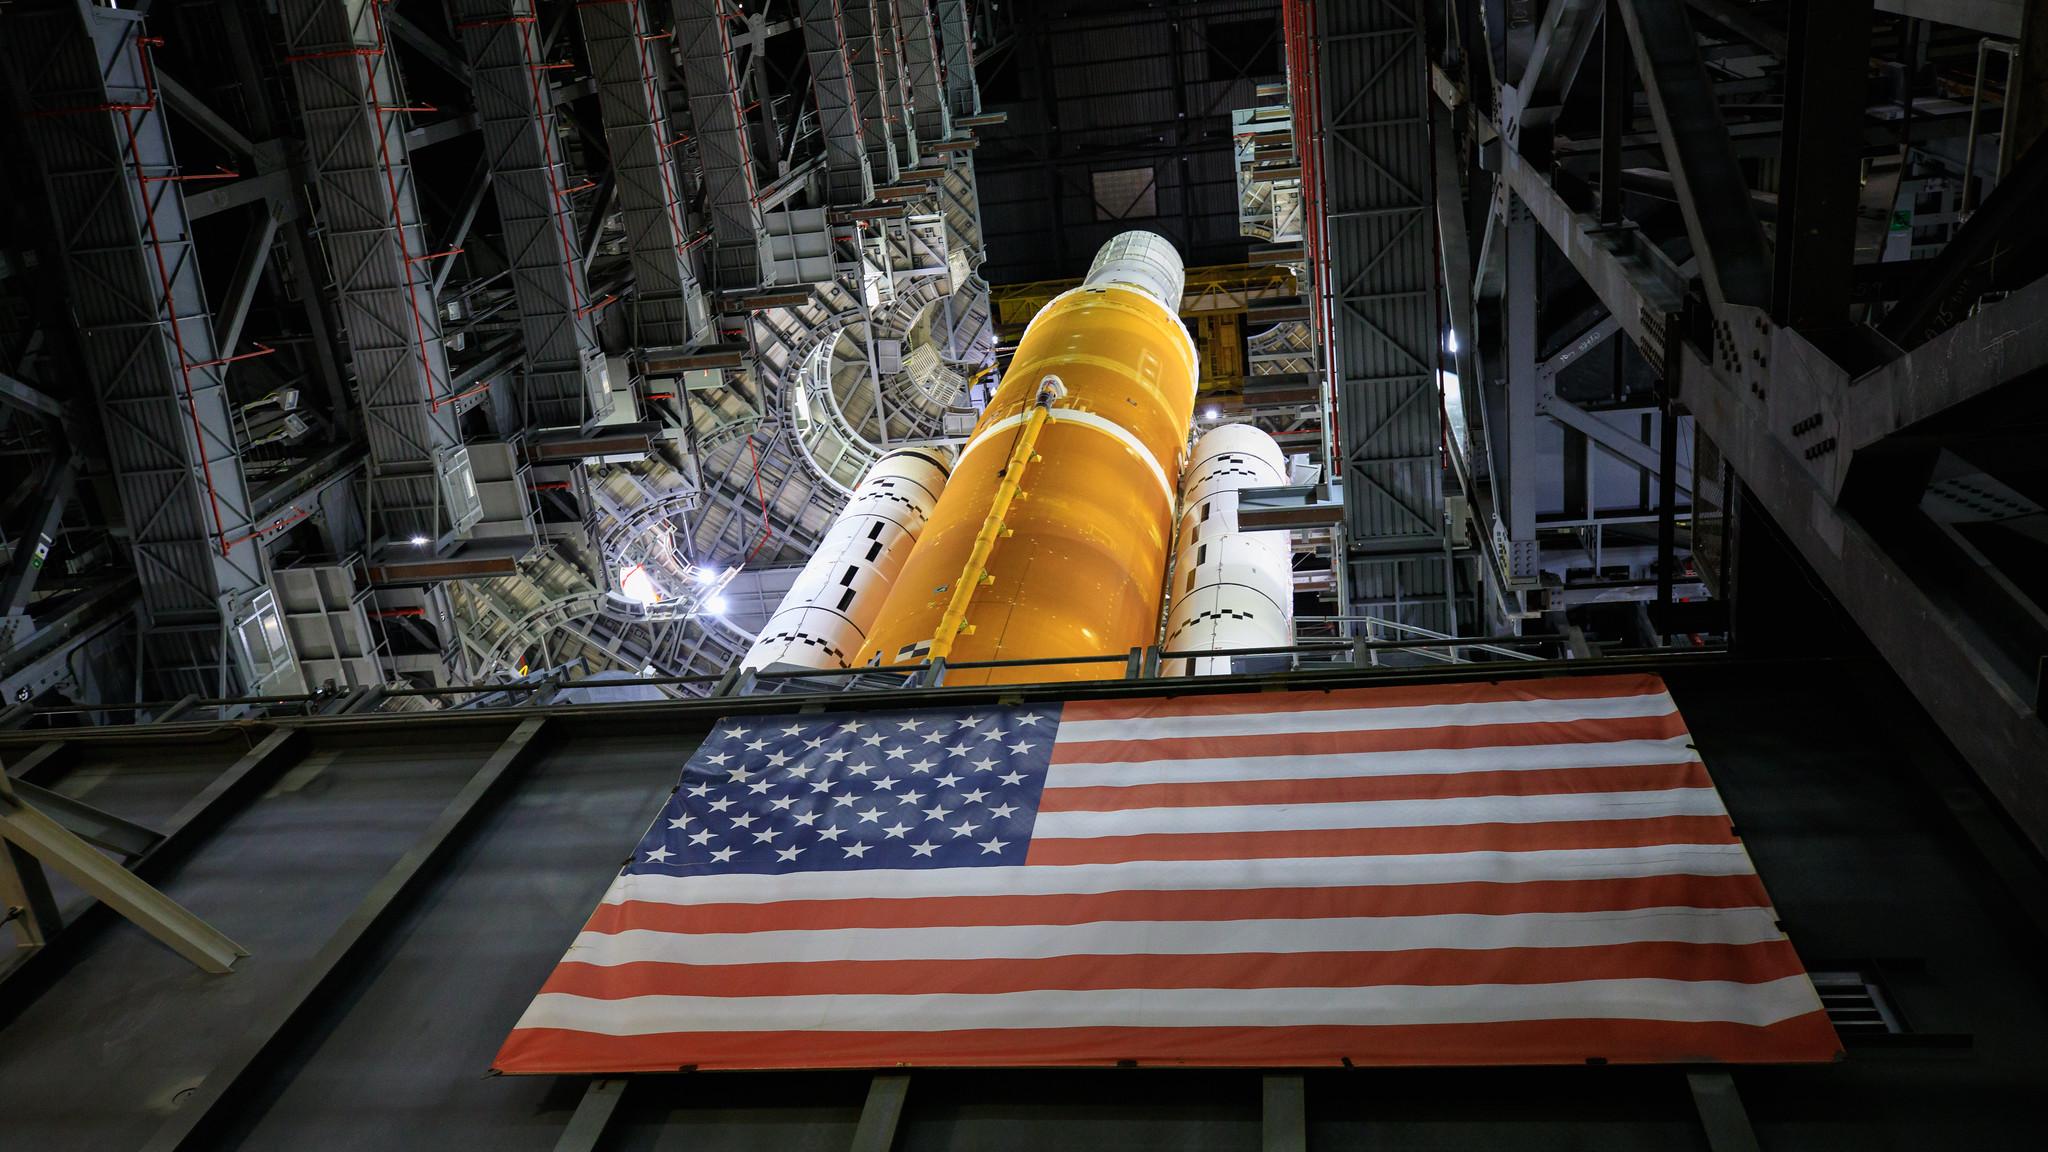 NASA completes umbilical test for SLS Artemis 1 mission - NASASpaceFlight.com - NASASpaceflight.com